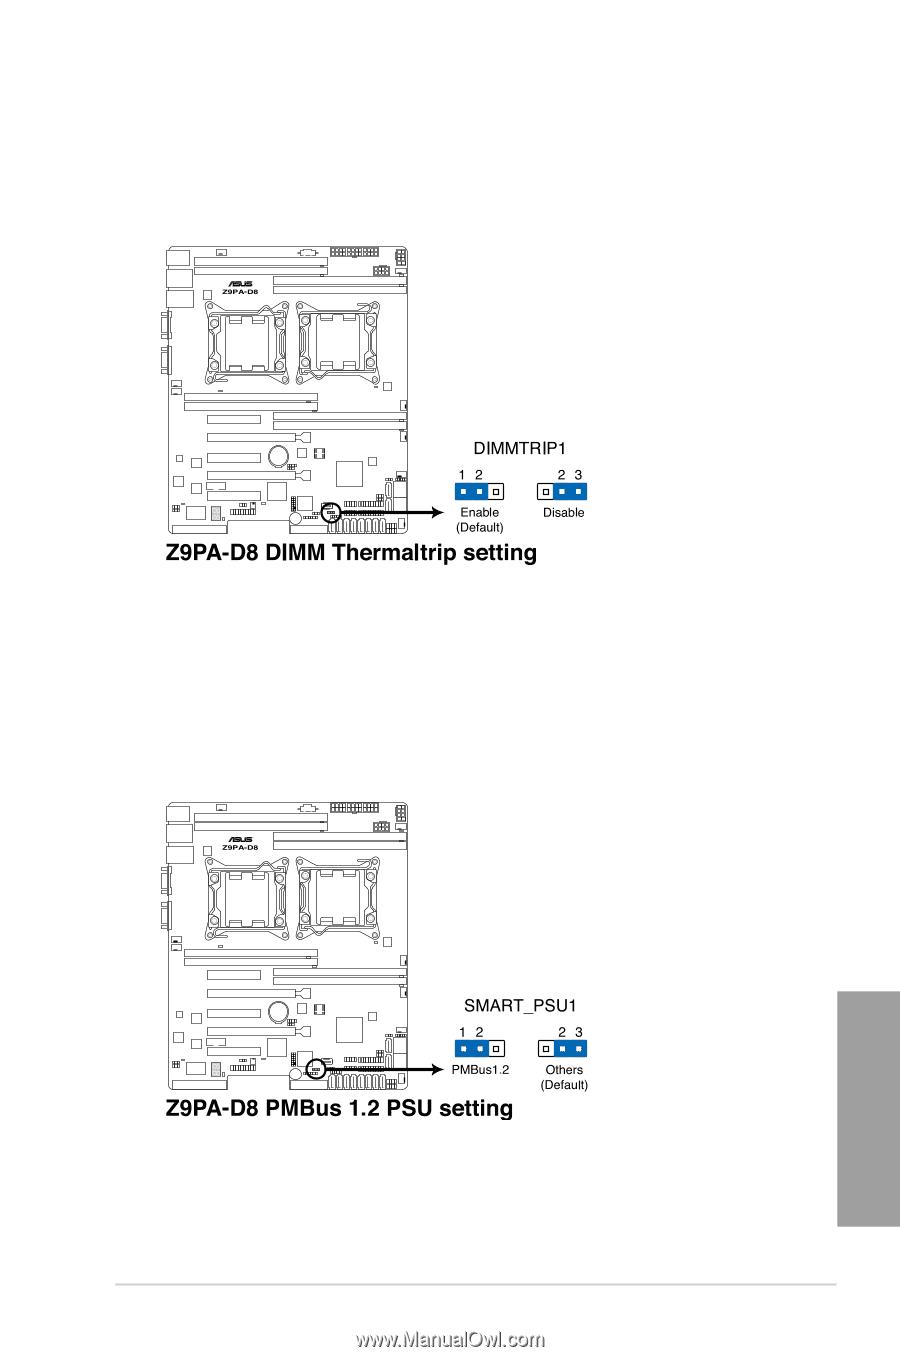 ASUS TS700-X7PS4 ASMEDIA USB 3.0 WINDOWS 7 X64 DRIVER